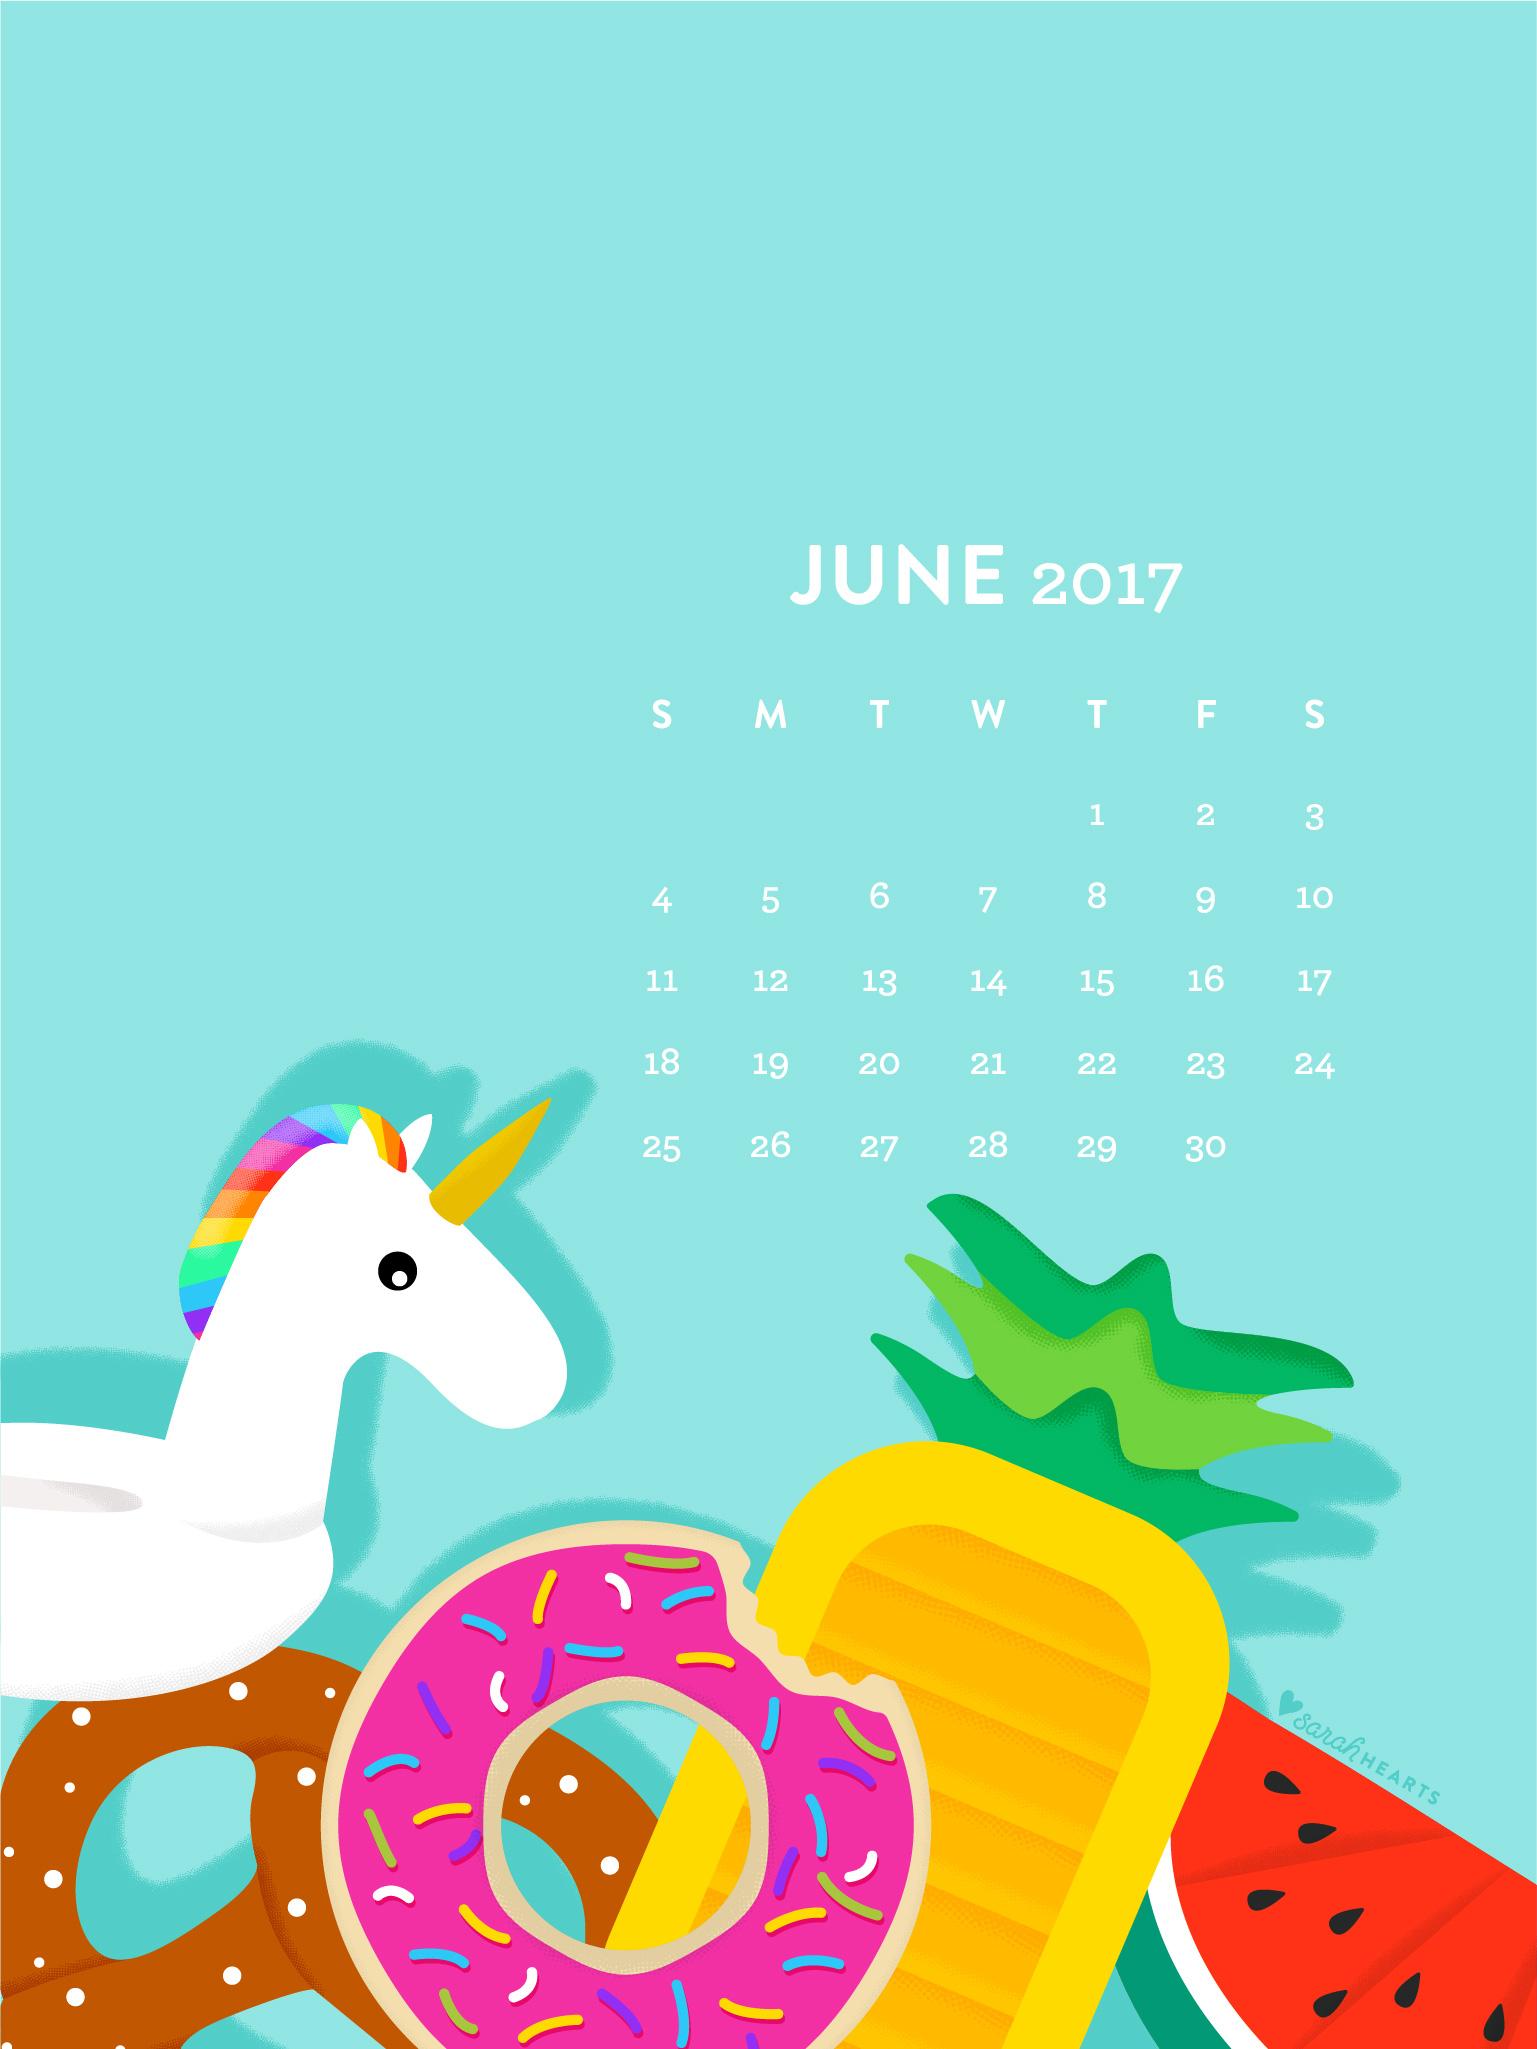 June 2017 Pool Float Calendar Wallpaper   Sarah Hearts 1537x2049